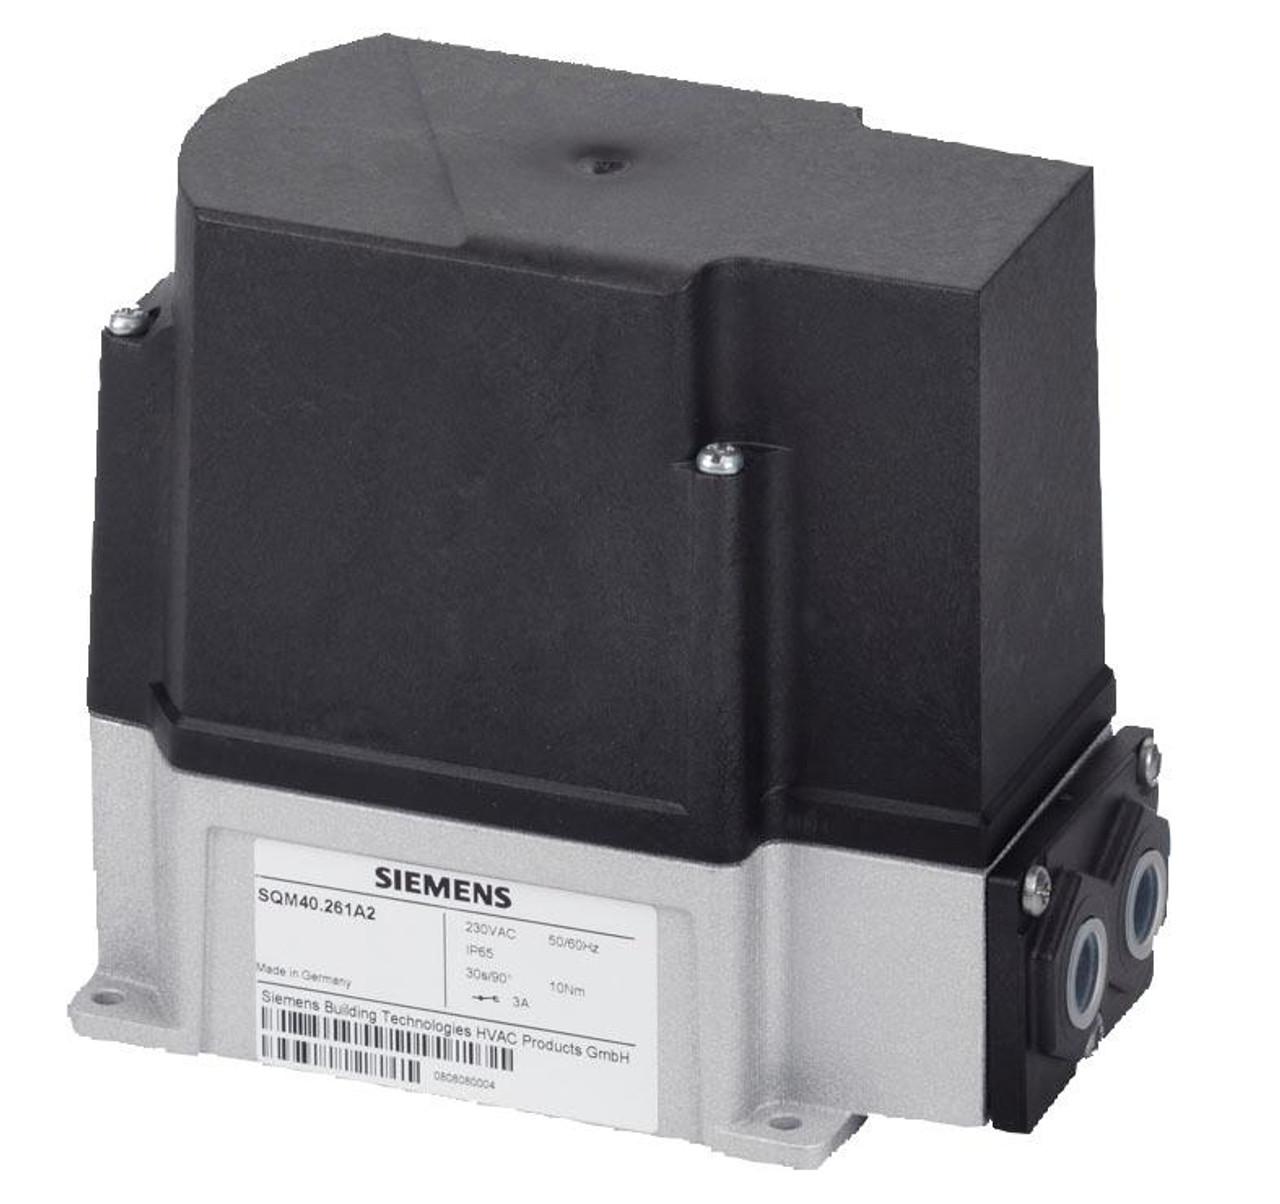 Siemens SQM40.261R11, Actuator, 10Nm, 90°/30s, cams, shaft 10mm+key, UL, 1 pot, AC120V